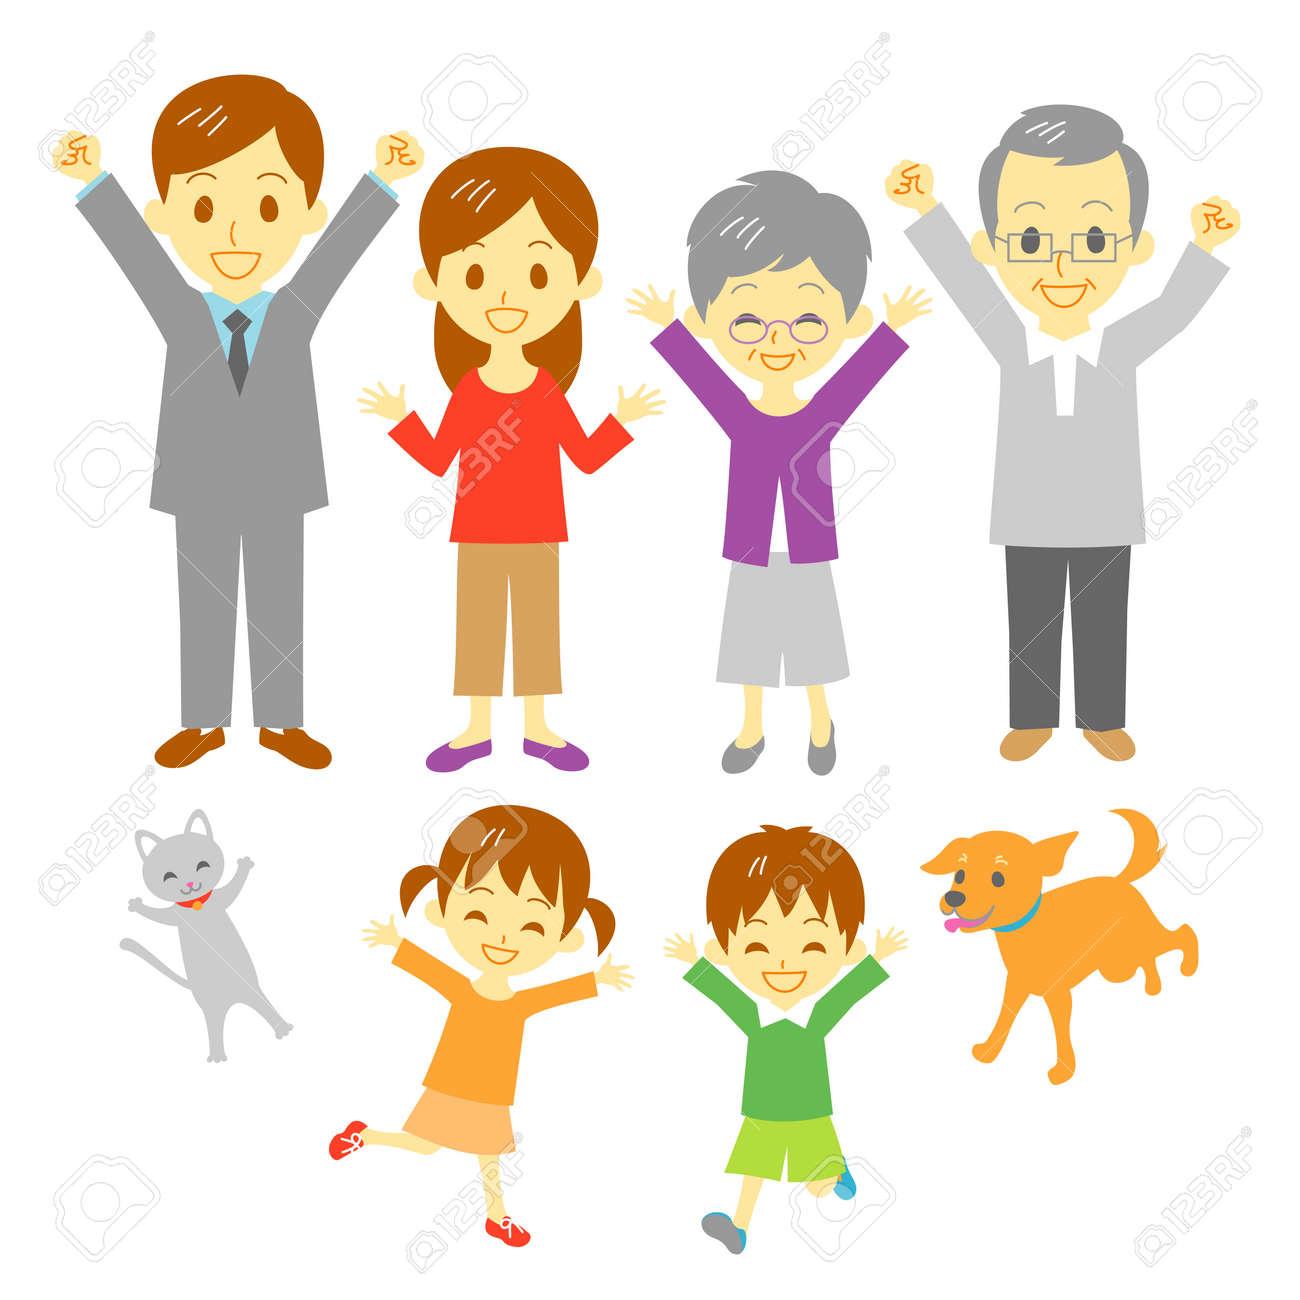 Joyful Family Three Generation Family Dog And Cat Royalty Free Cliparts Vectors And Stock Illustration Image 21215430